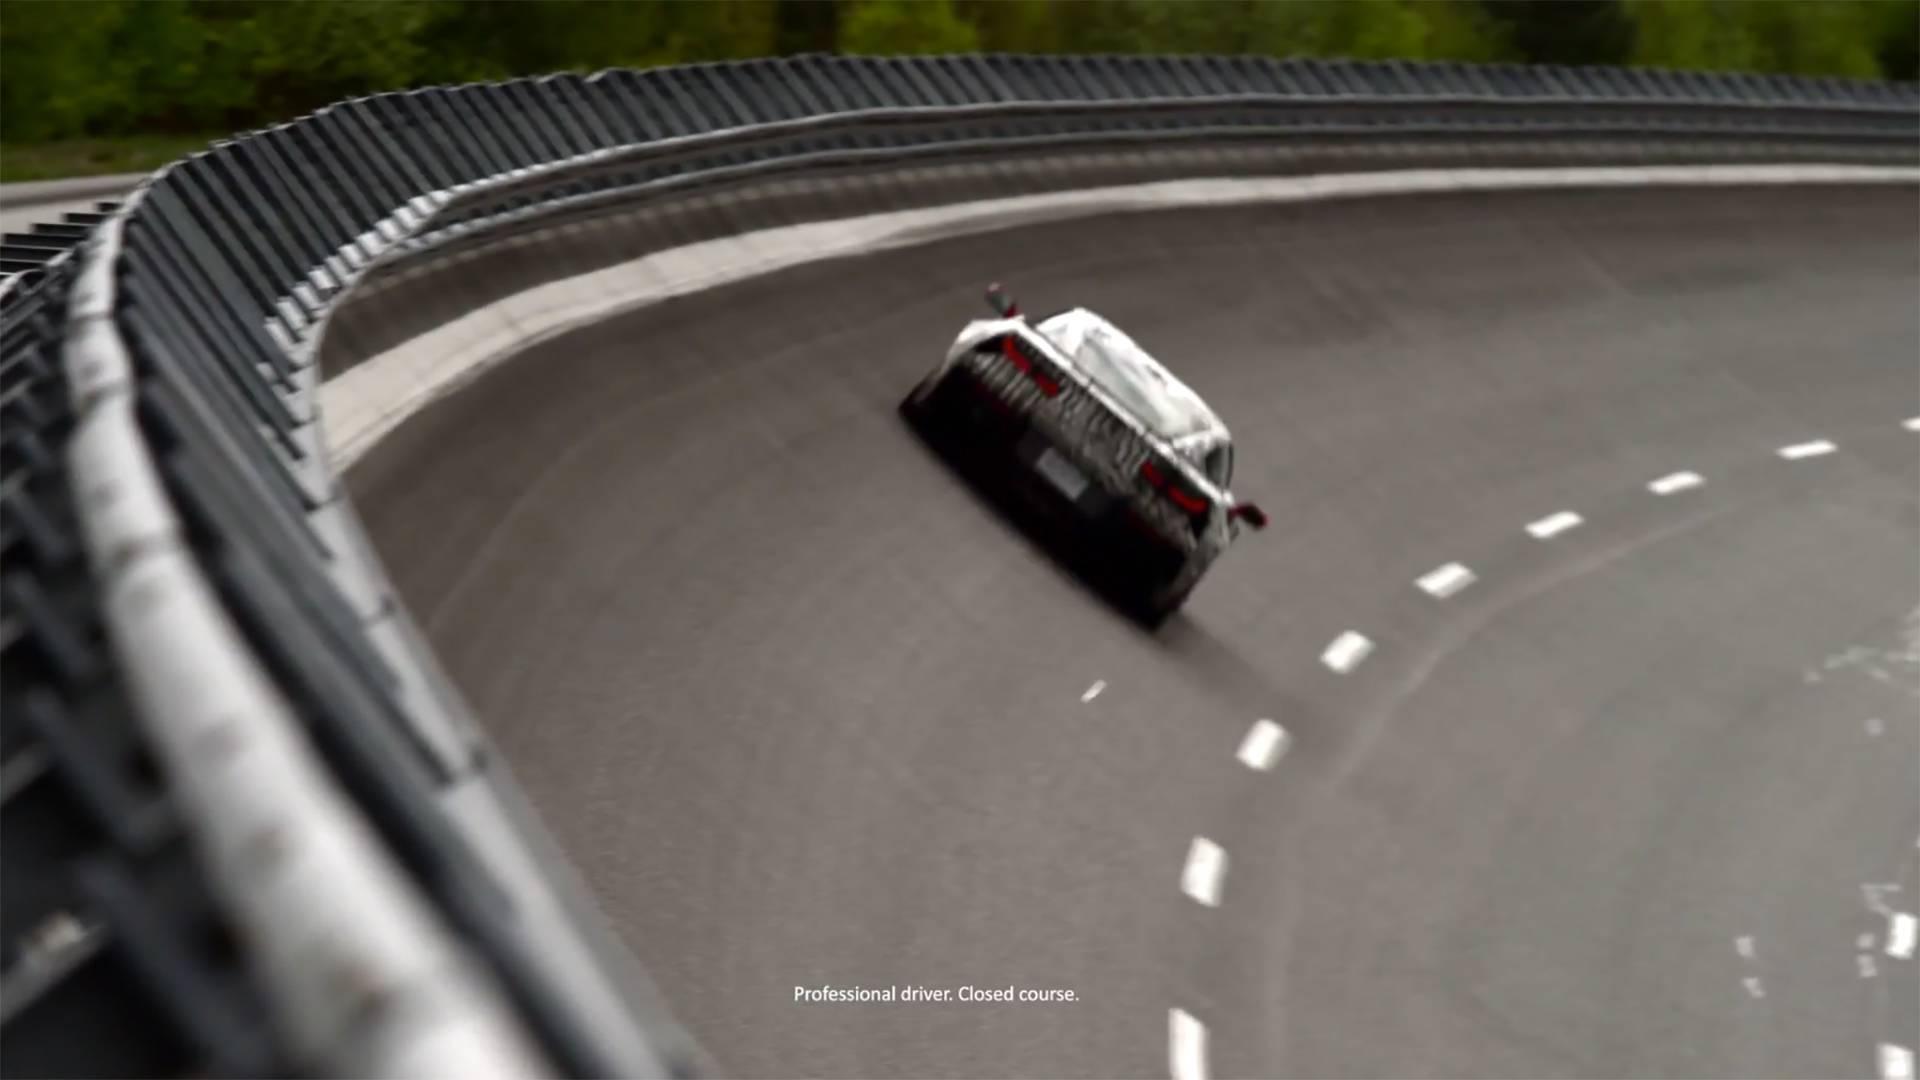 2019 Chevy Corvette ZR1 Clocks 212 MPH Official Top Speed